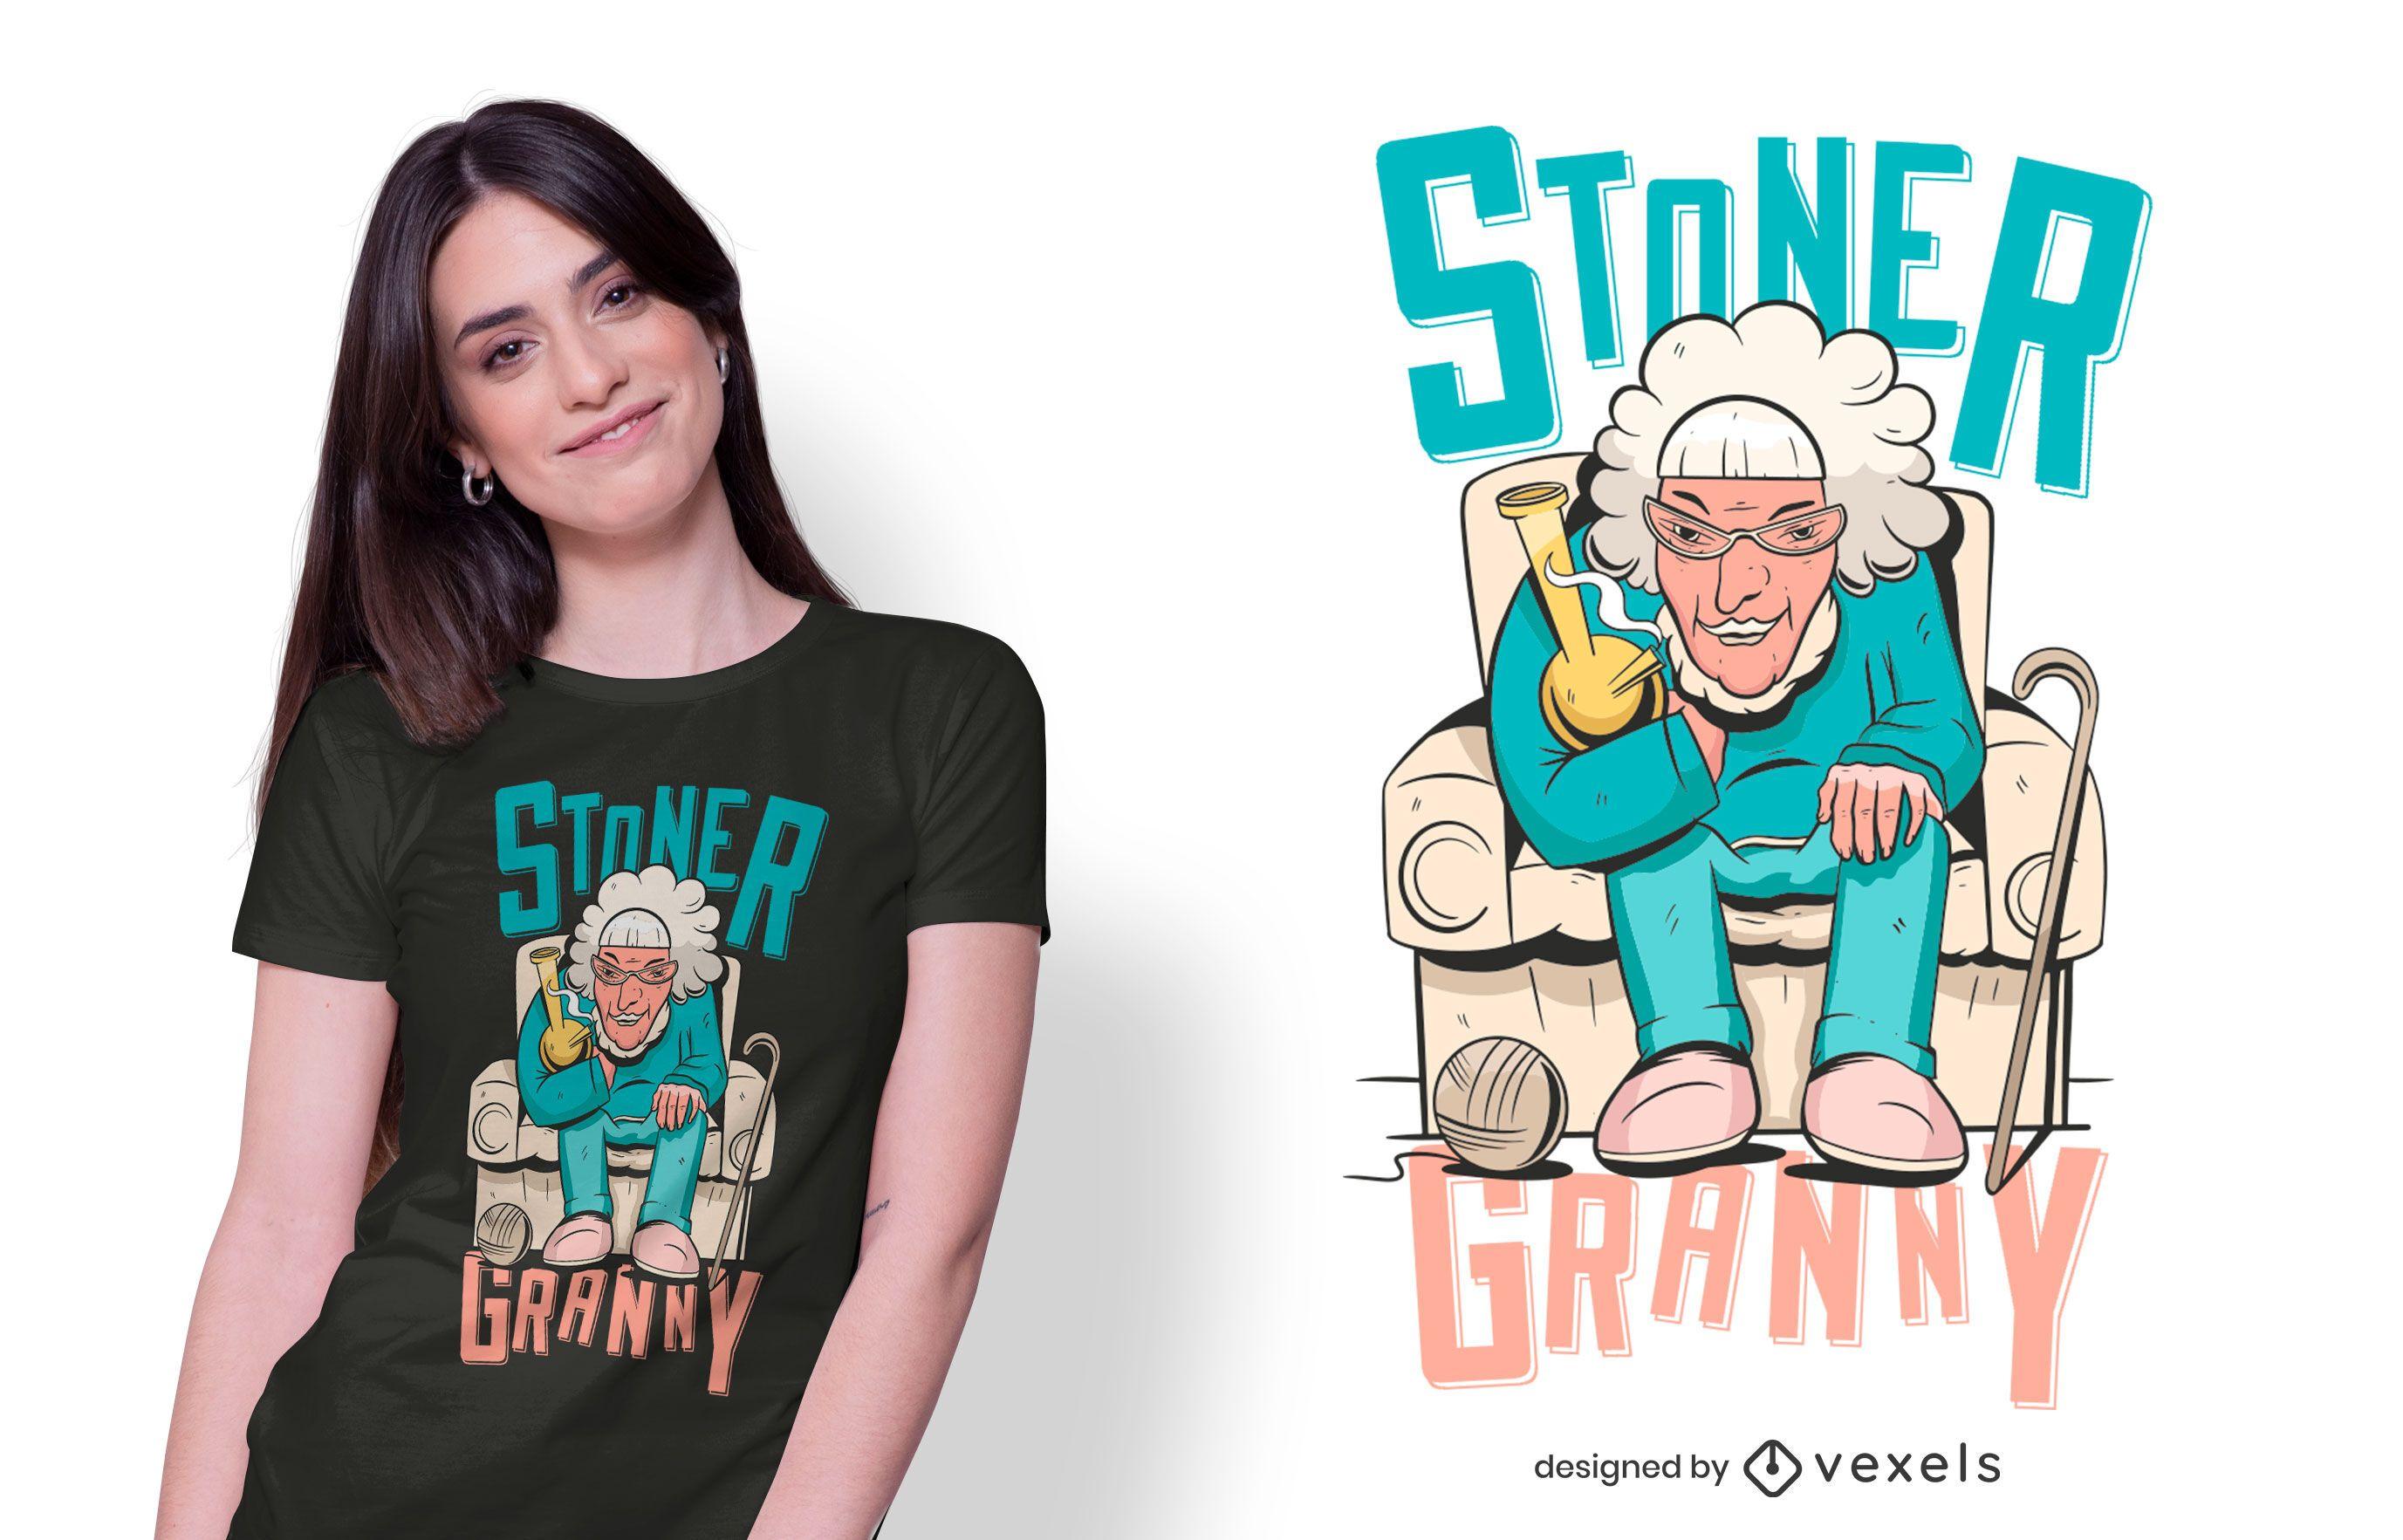 stoner granny t-shirt design